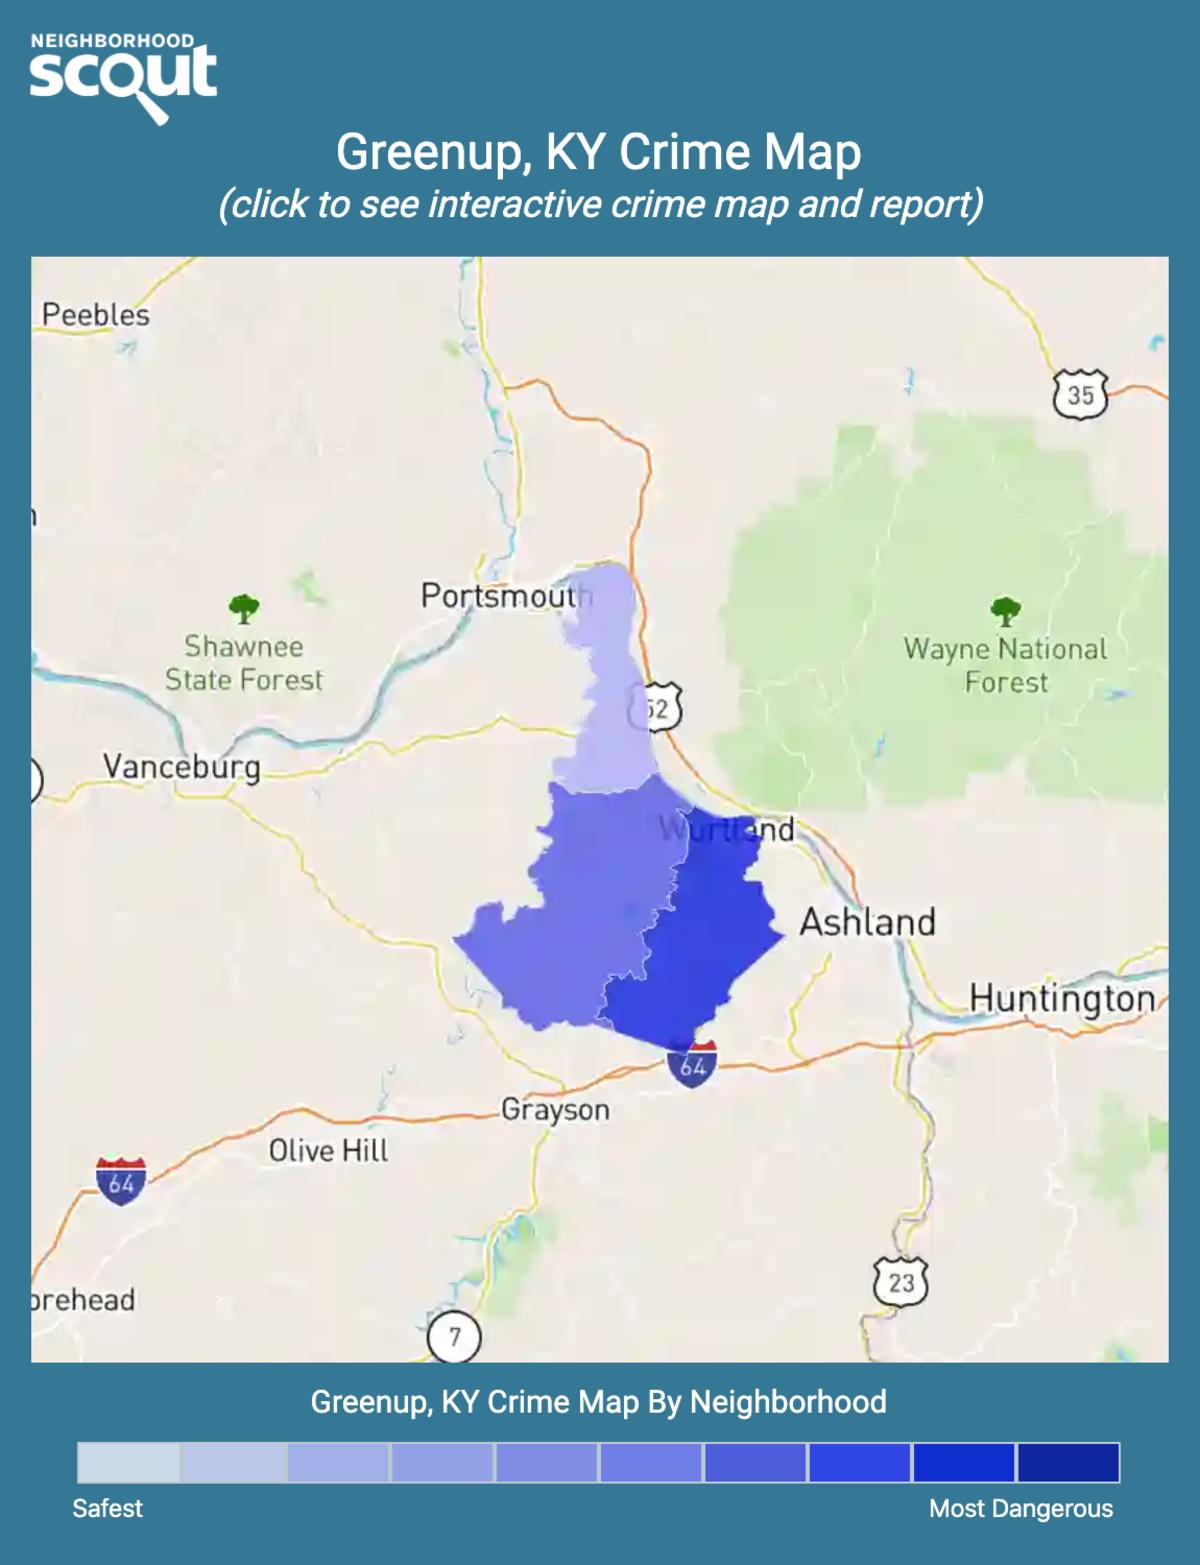 Greenup, Kentucky crime map